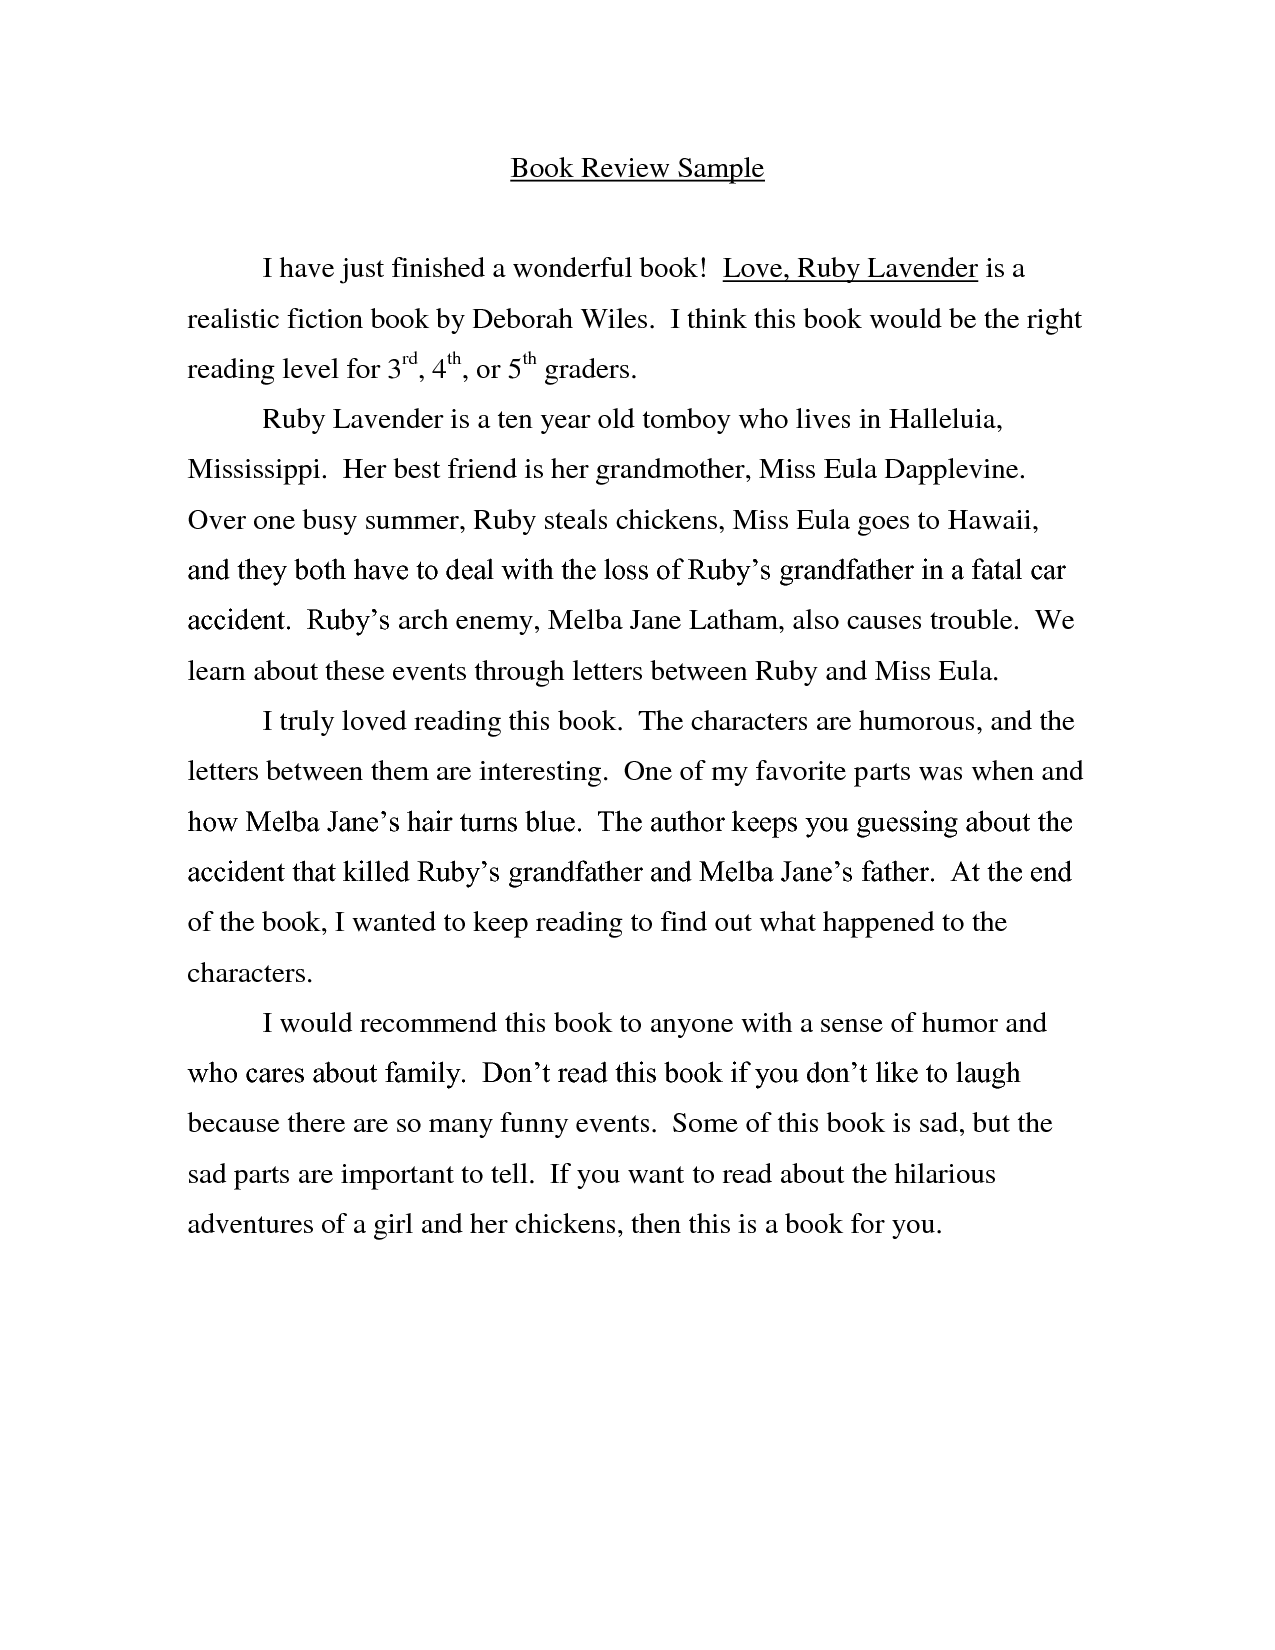 Book reviews ks13  Review essay, Essay examples, Academic essay